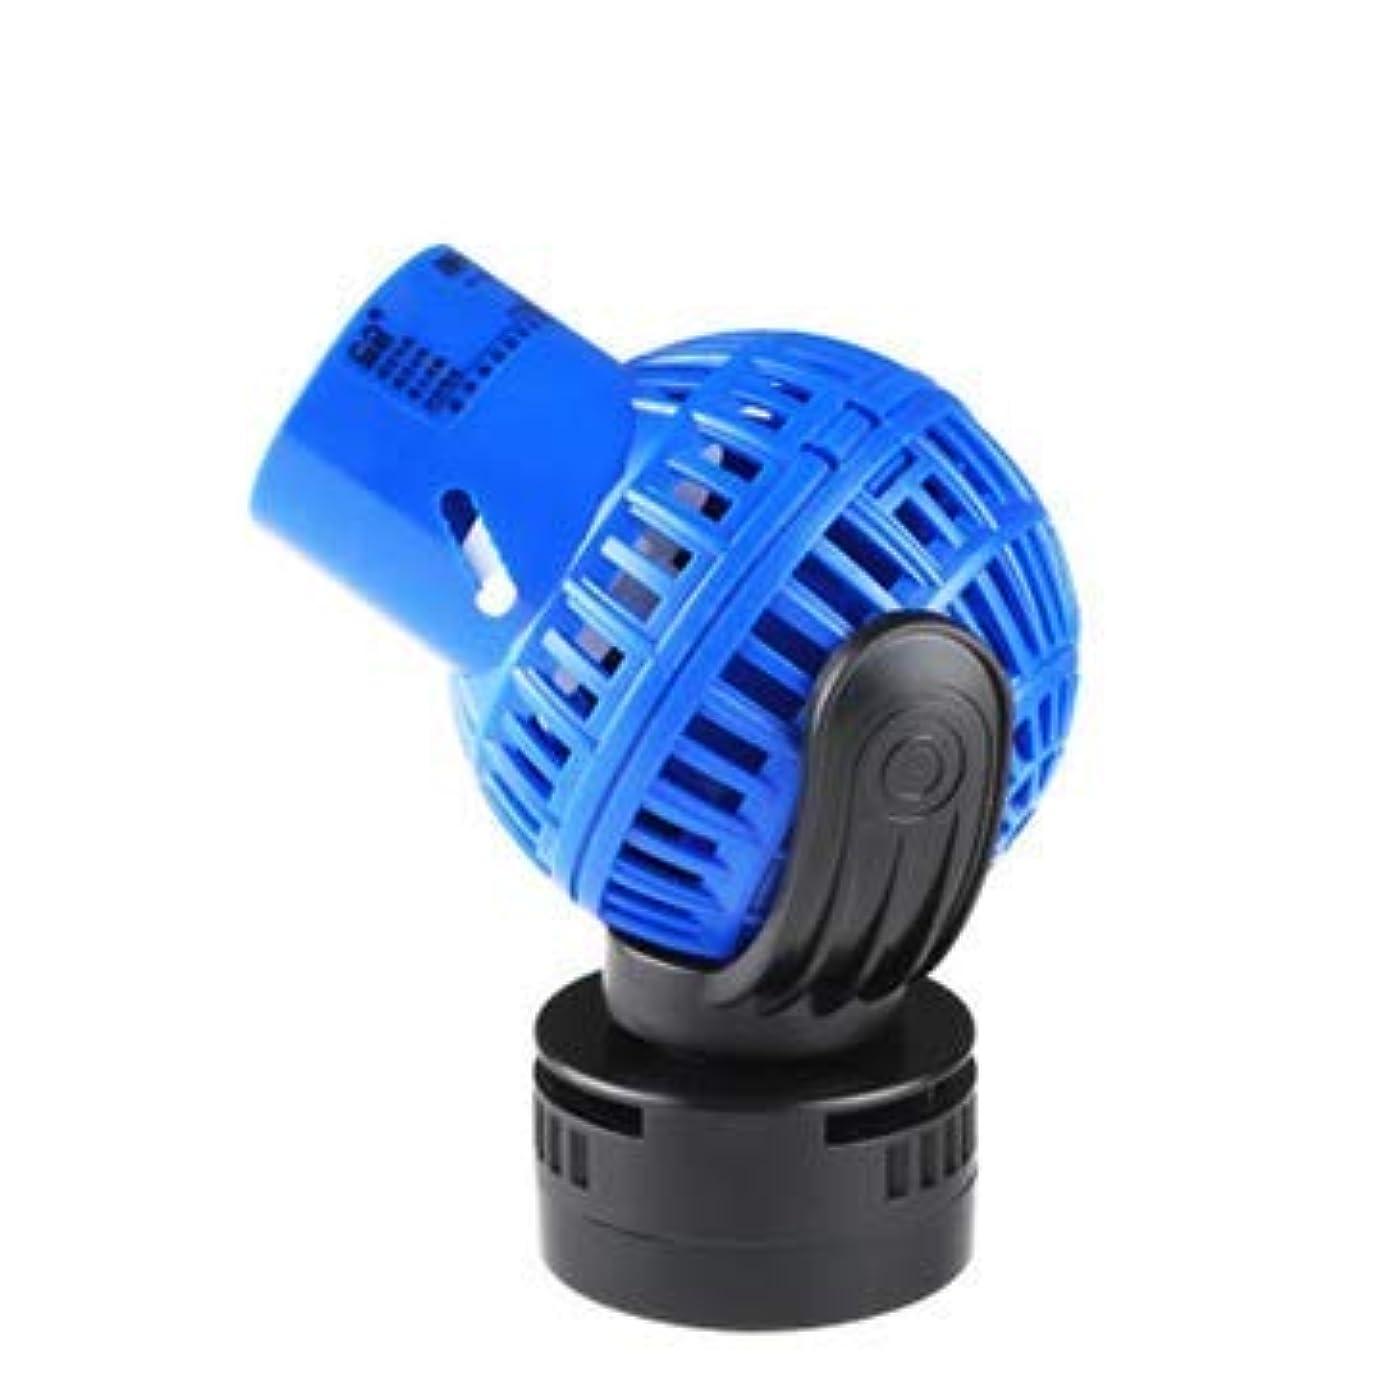 4000-10000L/H Aquarium Fish Tank 360 Water Wave Pump Powerhead Magnet Base - Electrical Equipment & Supplies Other Electrical Equipment - (#2) - 1x Aquarium Wave Maker